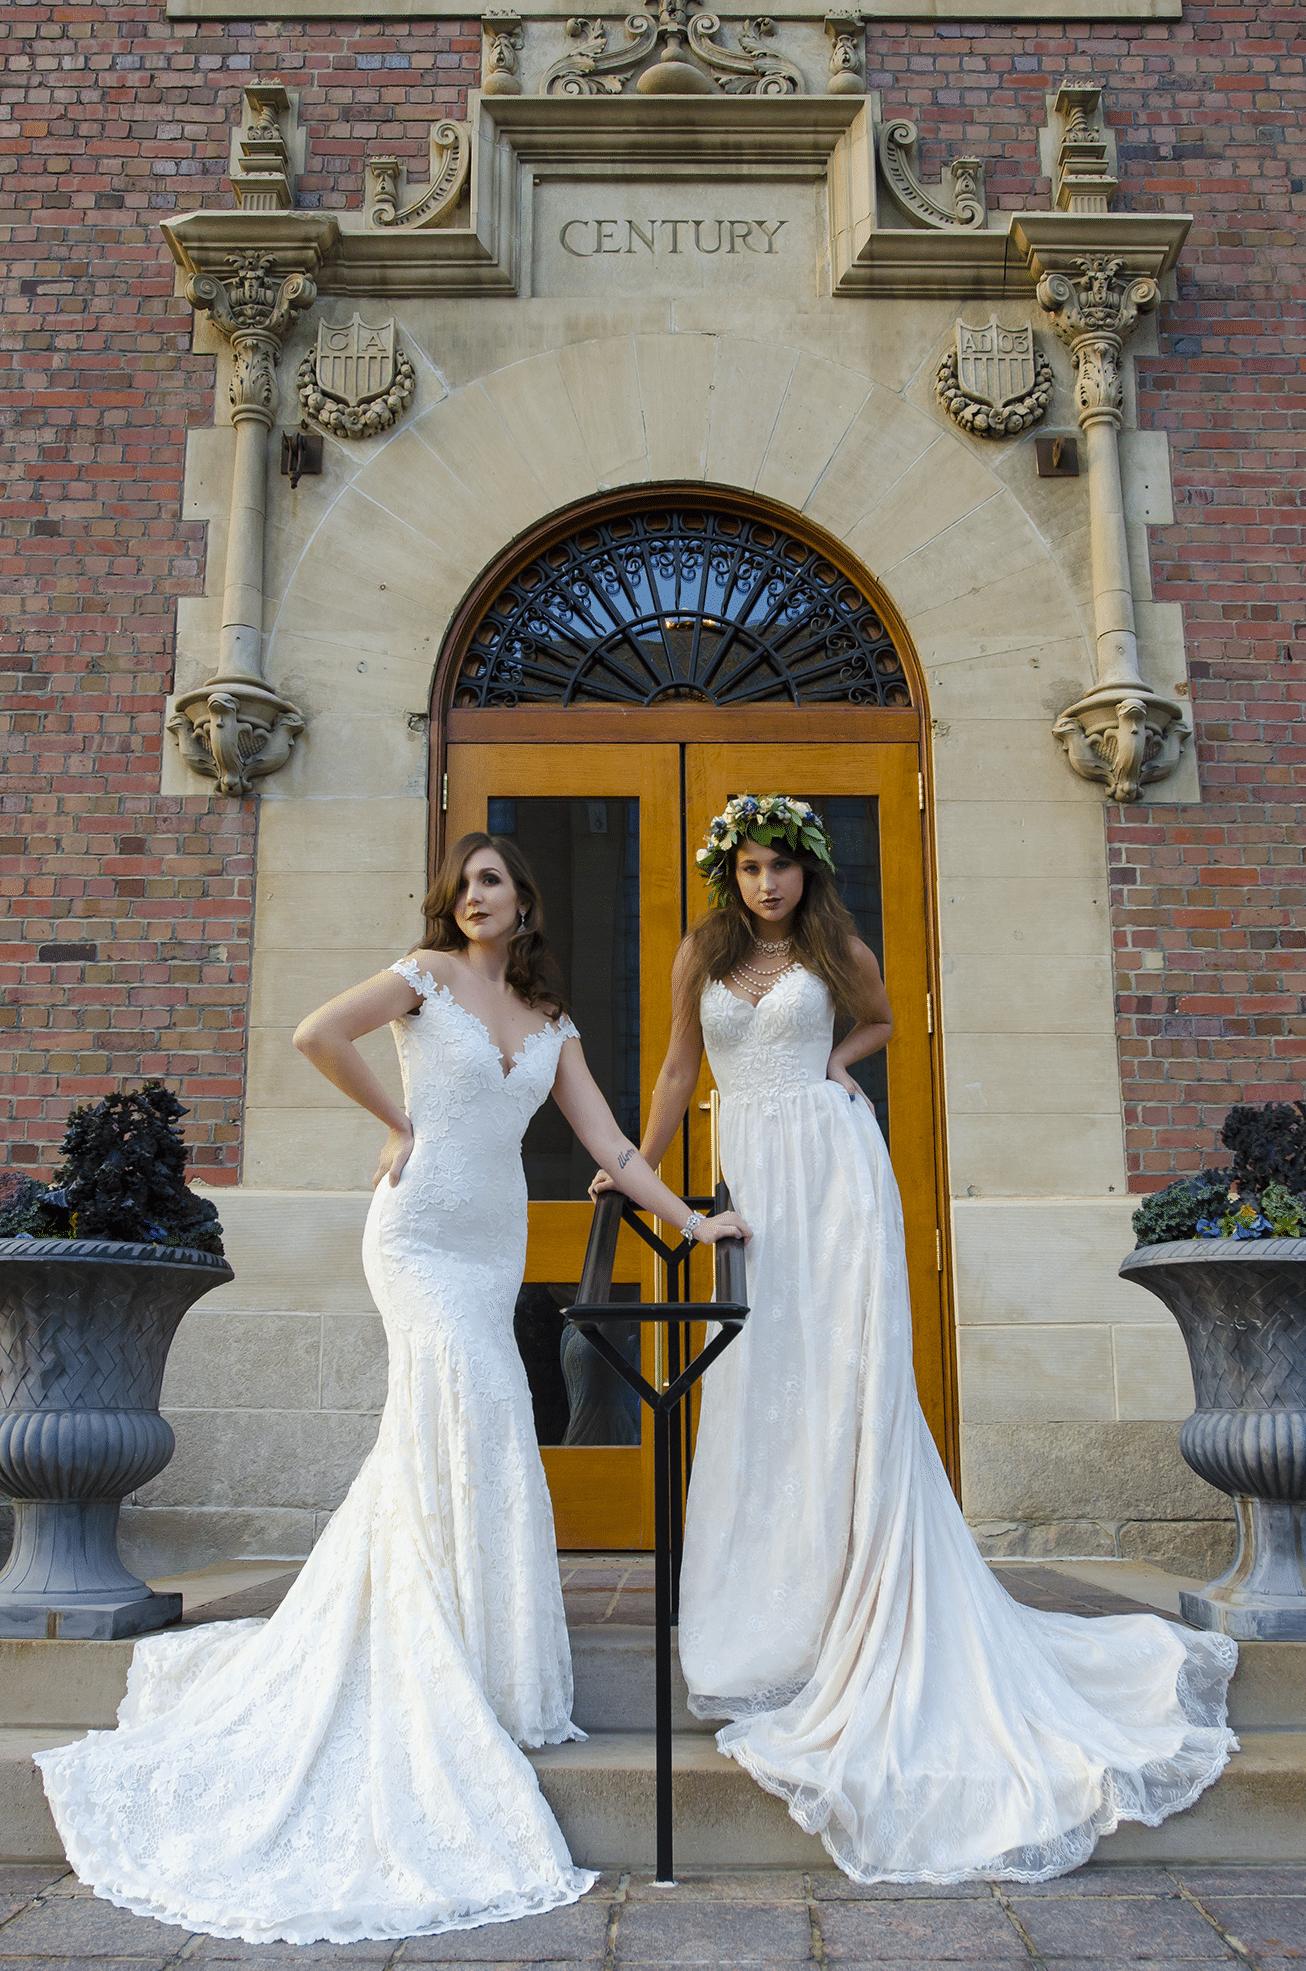 Wedding Dresses The Wedding Shoppe Wedding Dresses Unique Wedding Gowns Wedding Dress Alterations